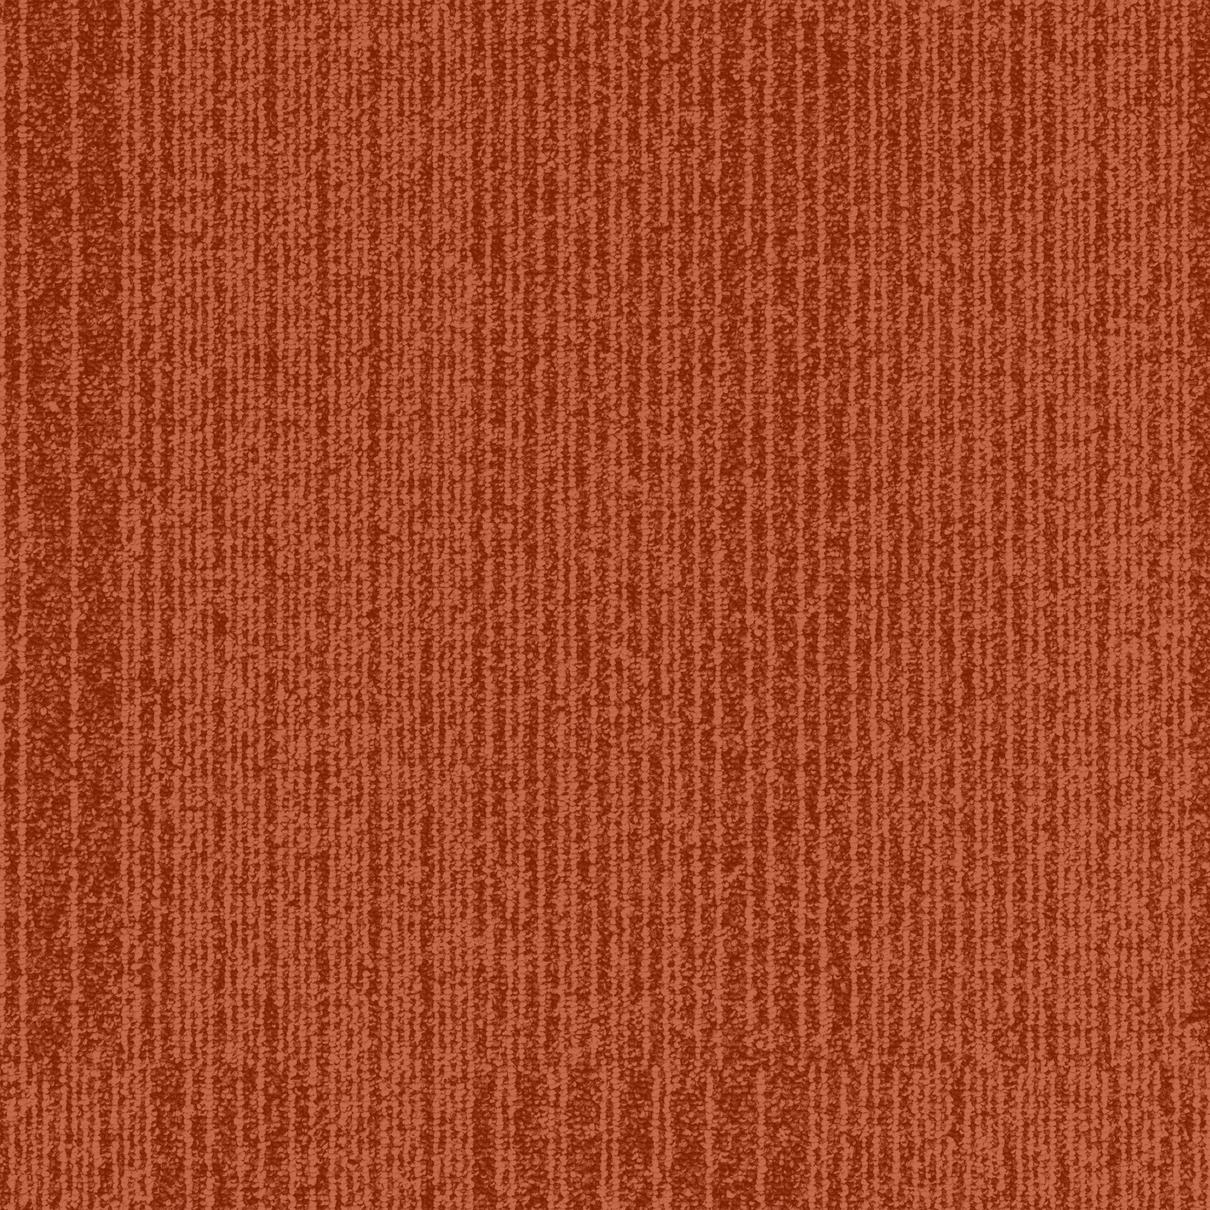 TRIV_N450.jpg